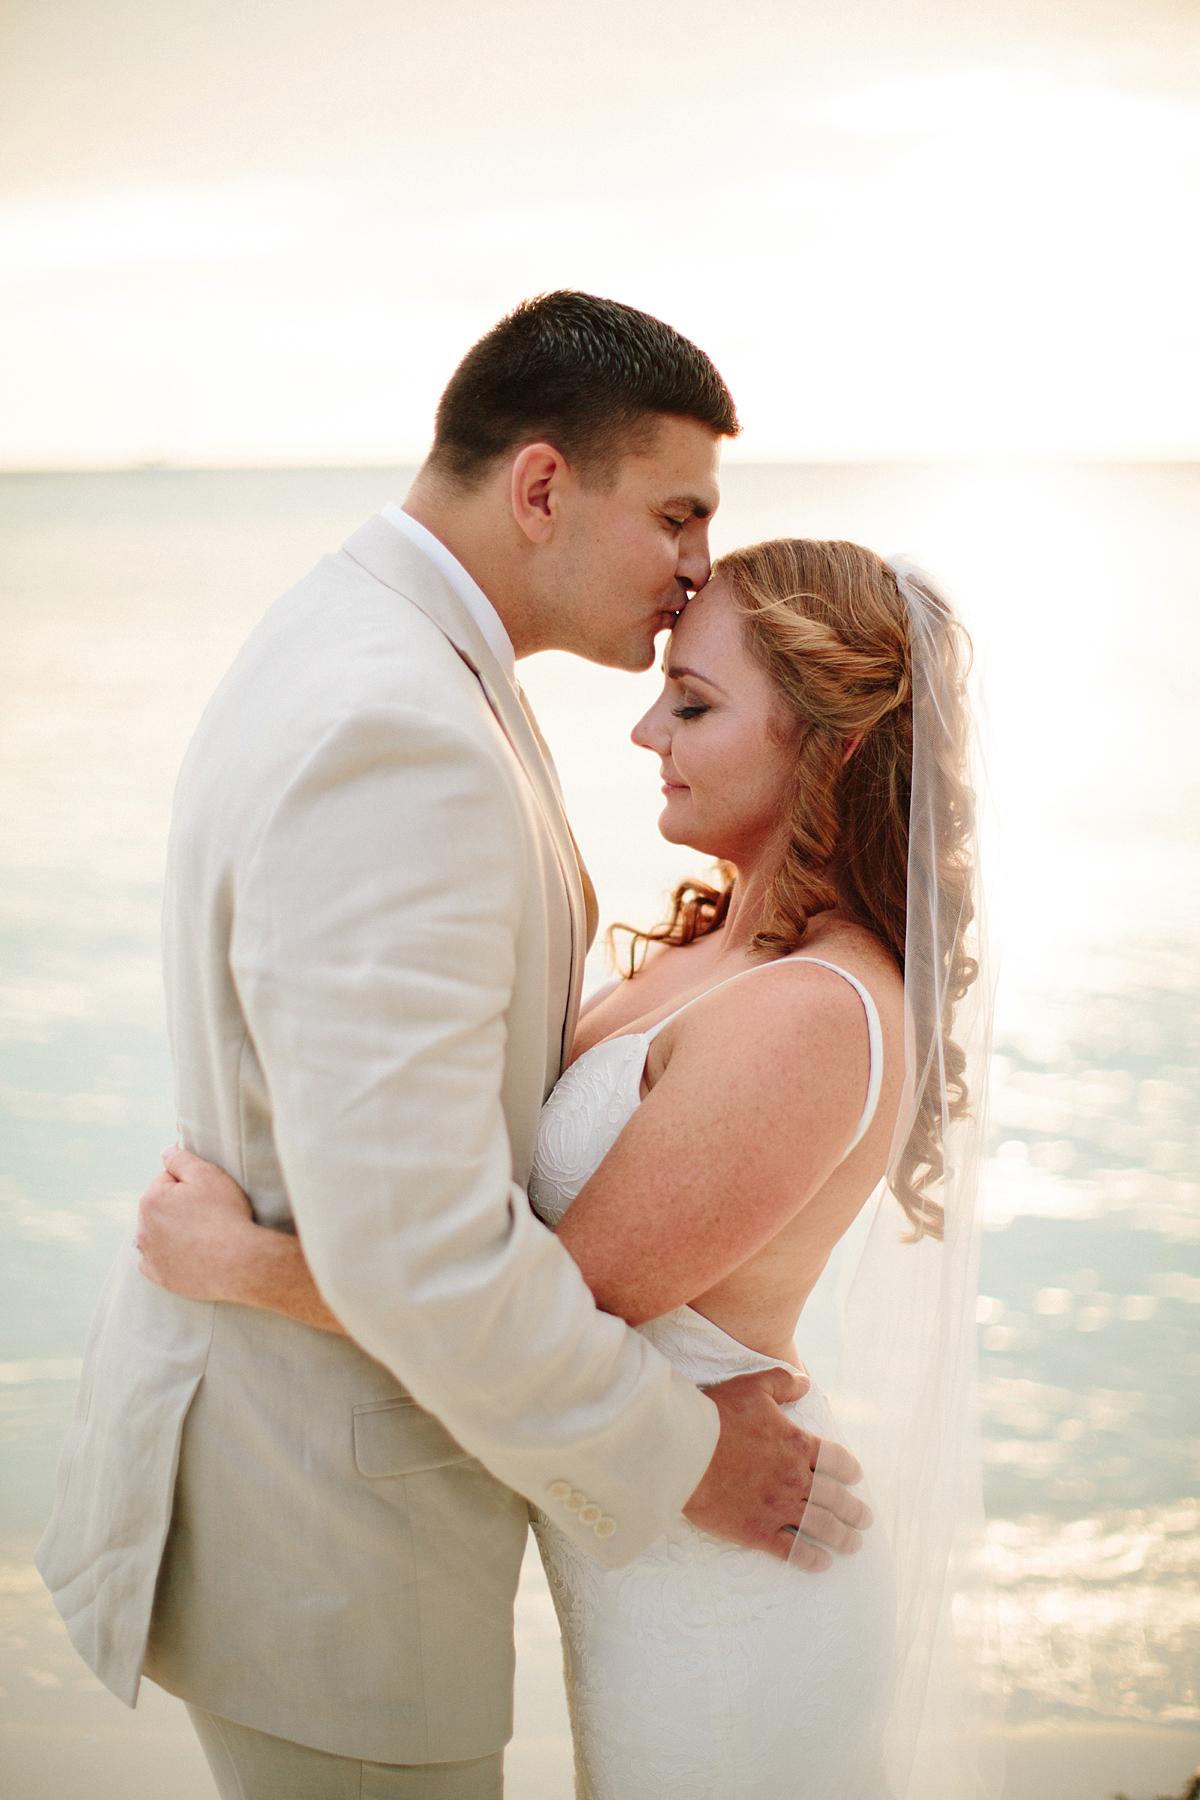 bahamas-destination-wedding-photographer-island-private-ceremony-staniel-cay_0037.jpg